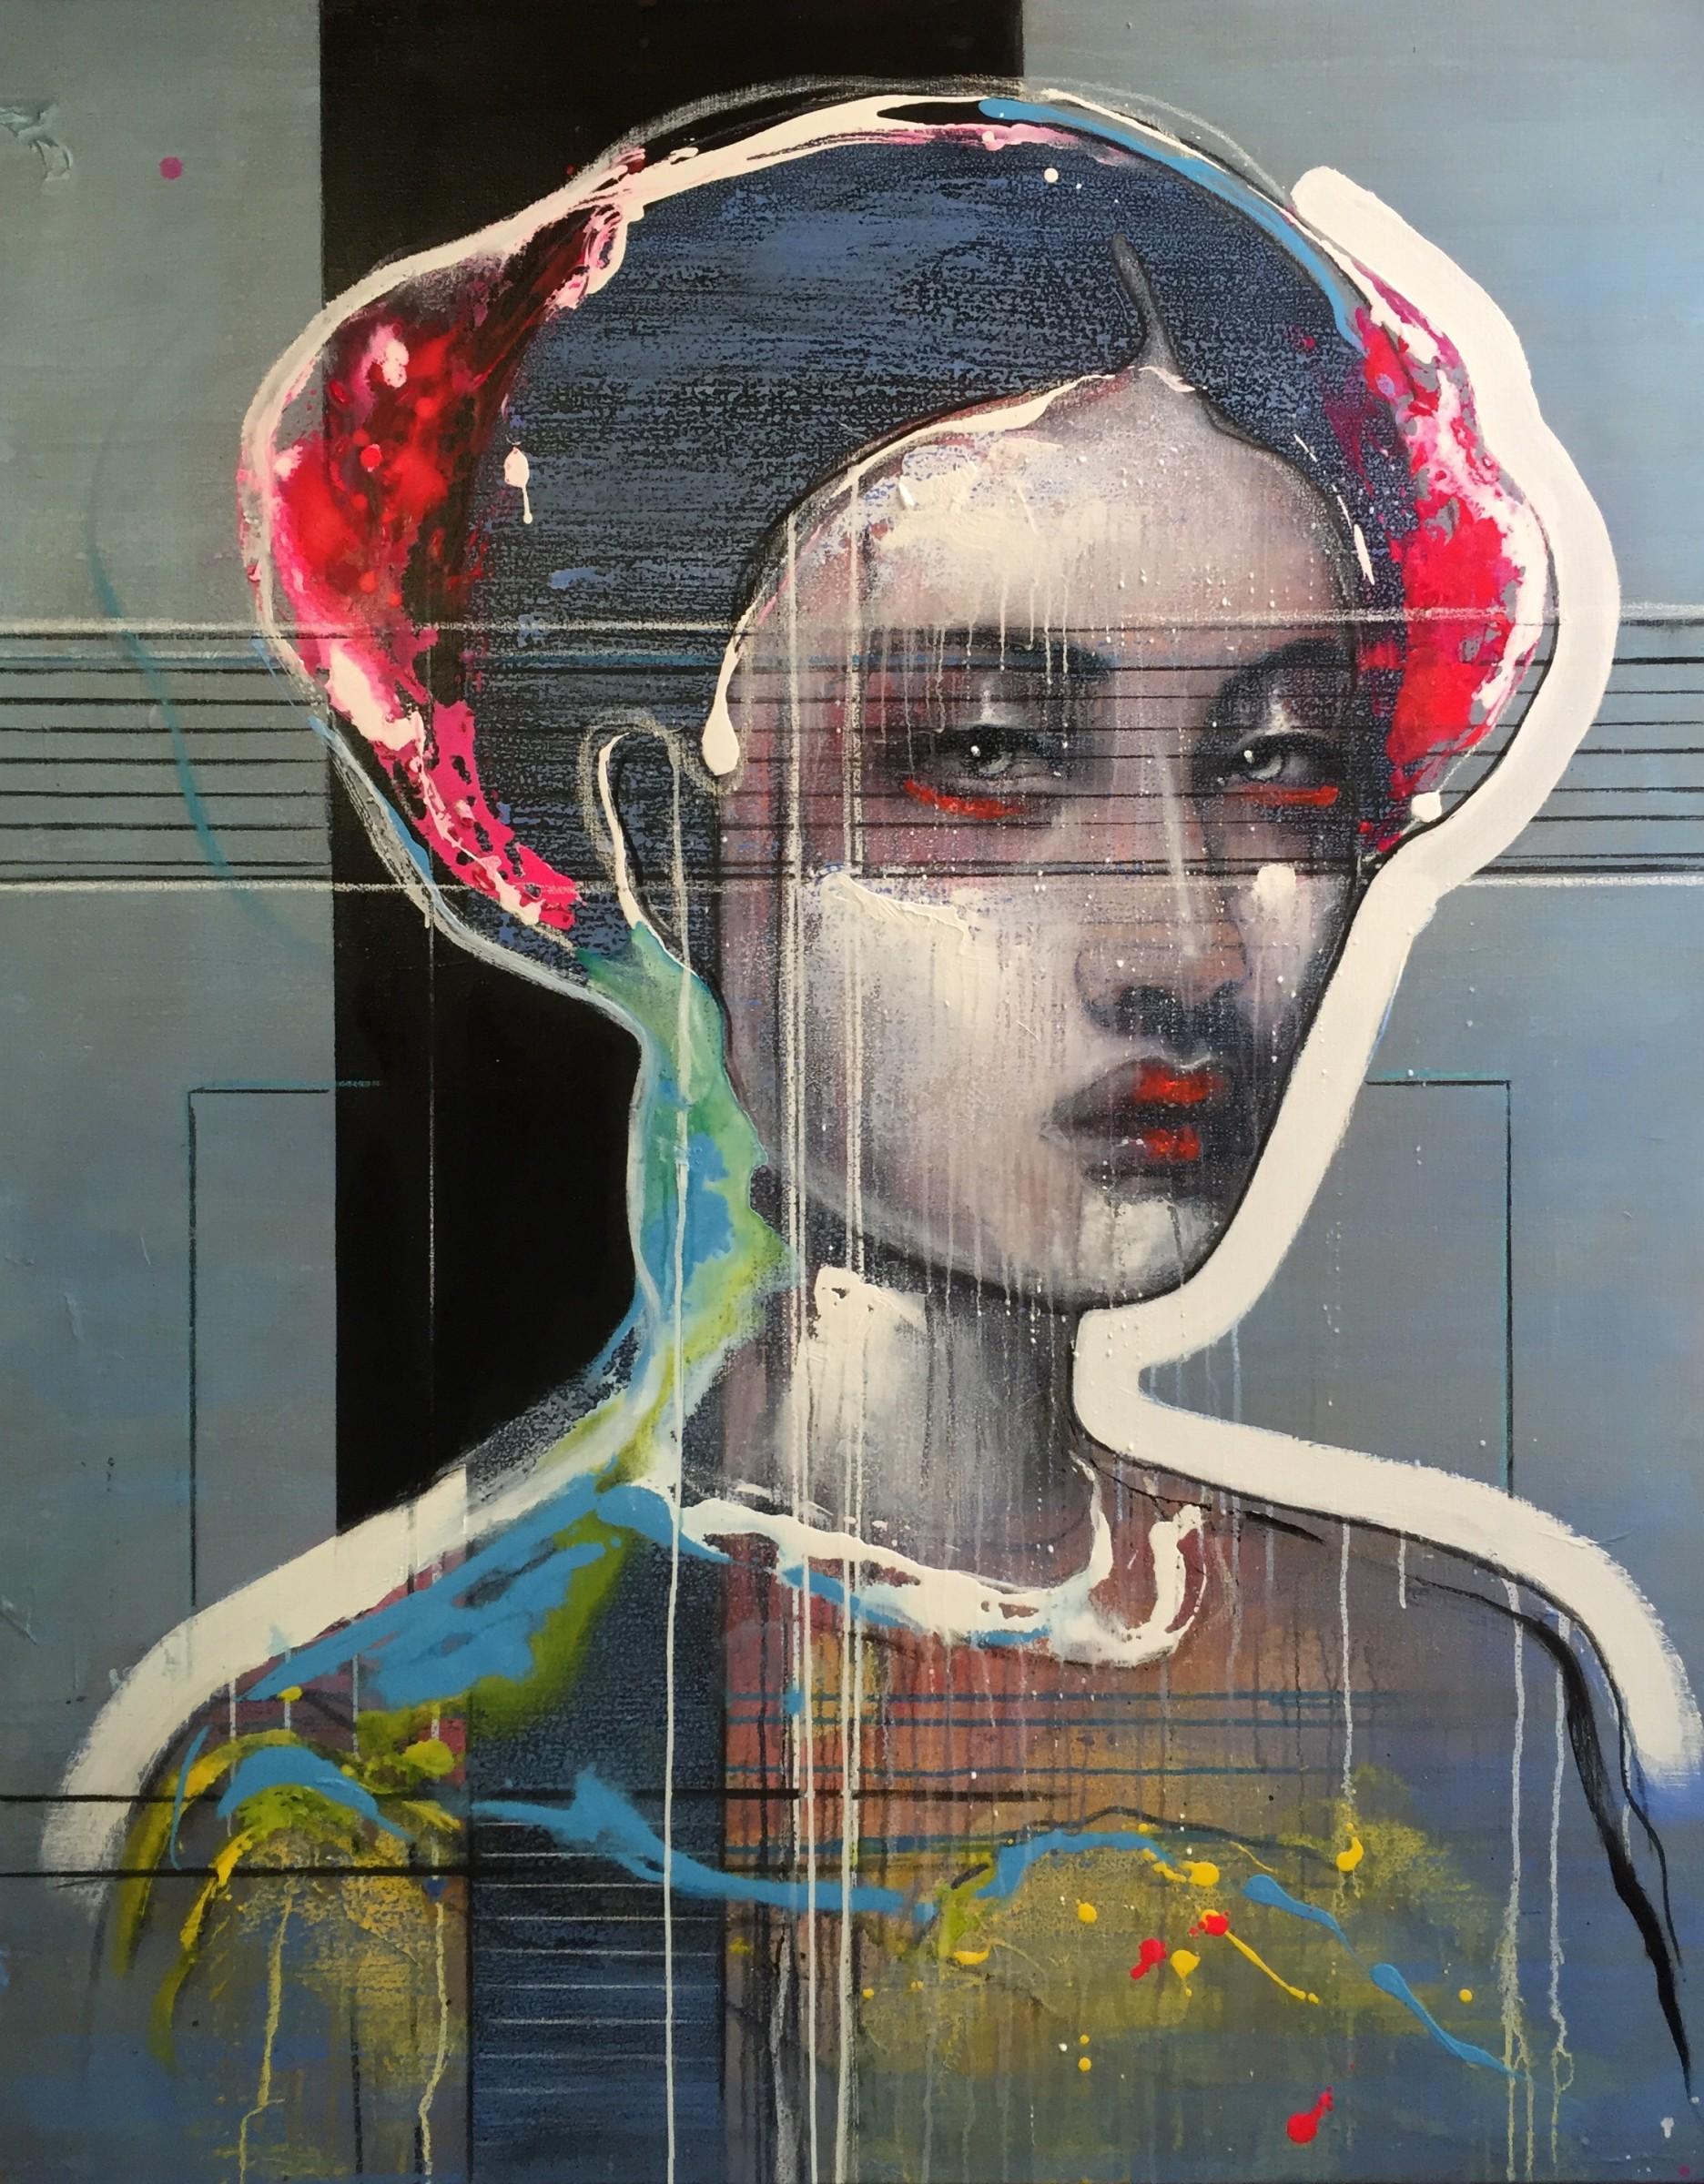 <span class=&#34;link fancybox-details-link&#34;><a href=&#34;/artists/40-ger-doornink/works/4204-ger-doornink-mona-lisa-2017/&#34;>View Detail Page</a></span><div class=&#34;artist&#34;><strong>Ger Doornink</strong></div> <div class=&#34;title&#34;><em>Mona Lisa</em>, 2017</div> <div class=&#34;medium&#34;>Oil on Canvas</div> <div class=&#34;dimensions&#34;>150 x 120 cm<br /> 59 1/8 x 47 1/4 in</div>